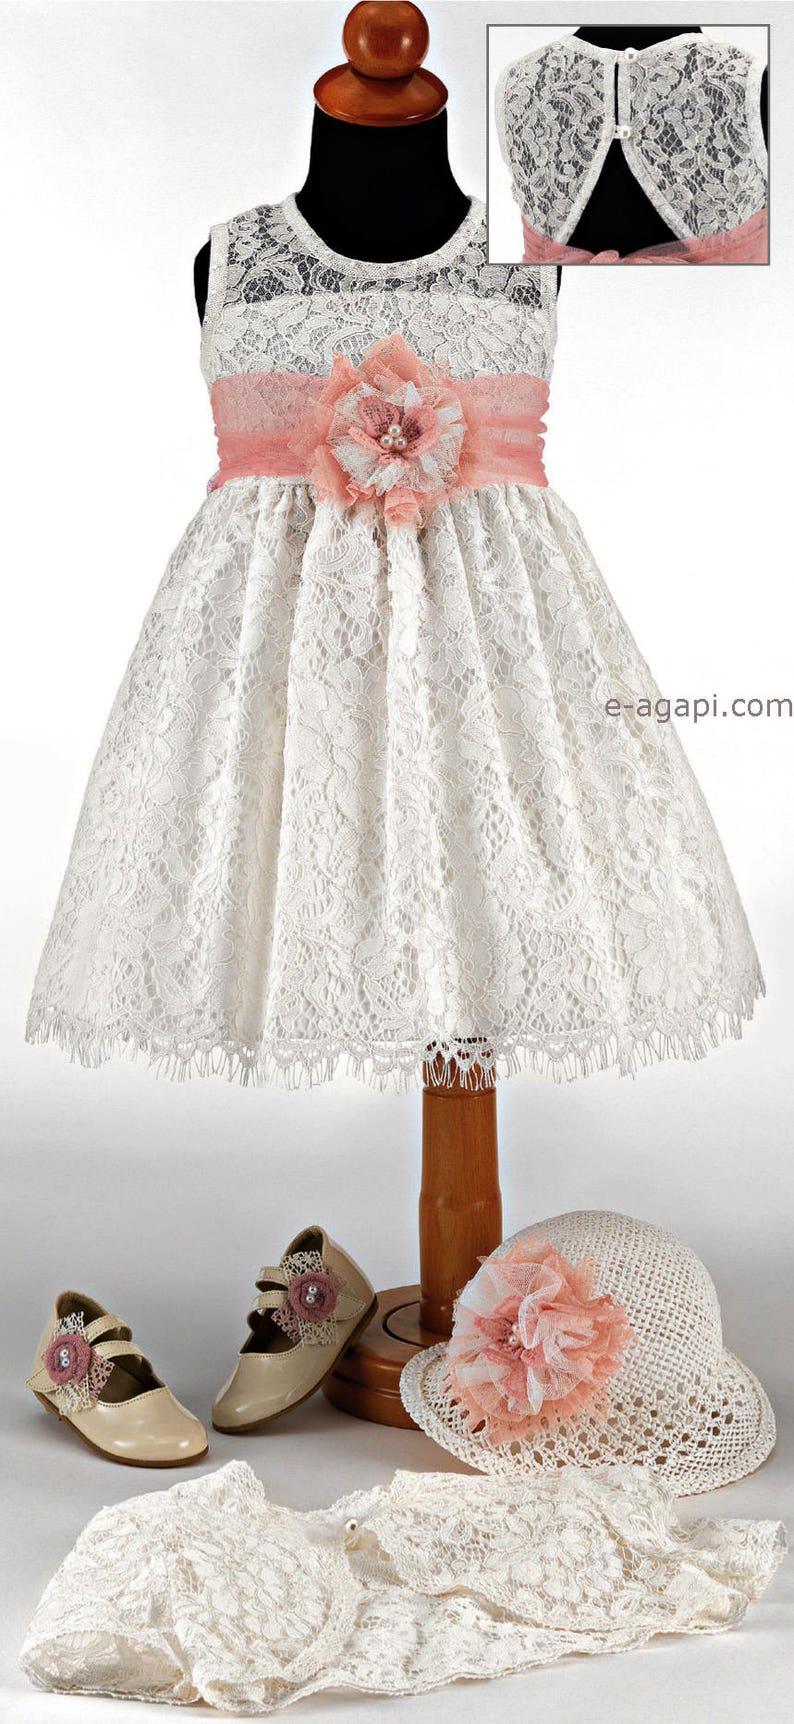 80b6467af662f Baby girl baptism dress Couture chic baby girl christening dresses Flower  girl white dress Greek baptism outfit Wedding lace summer dress